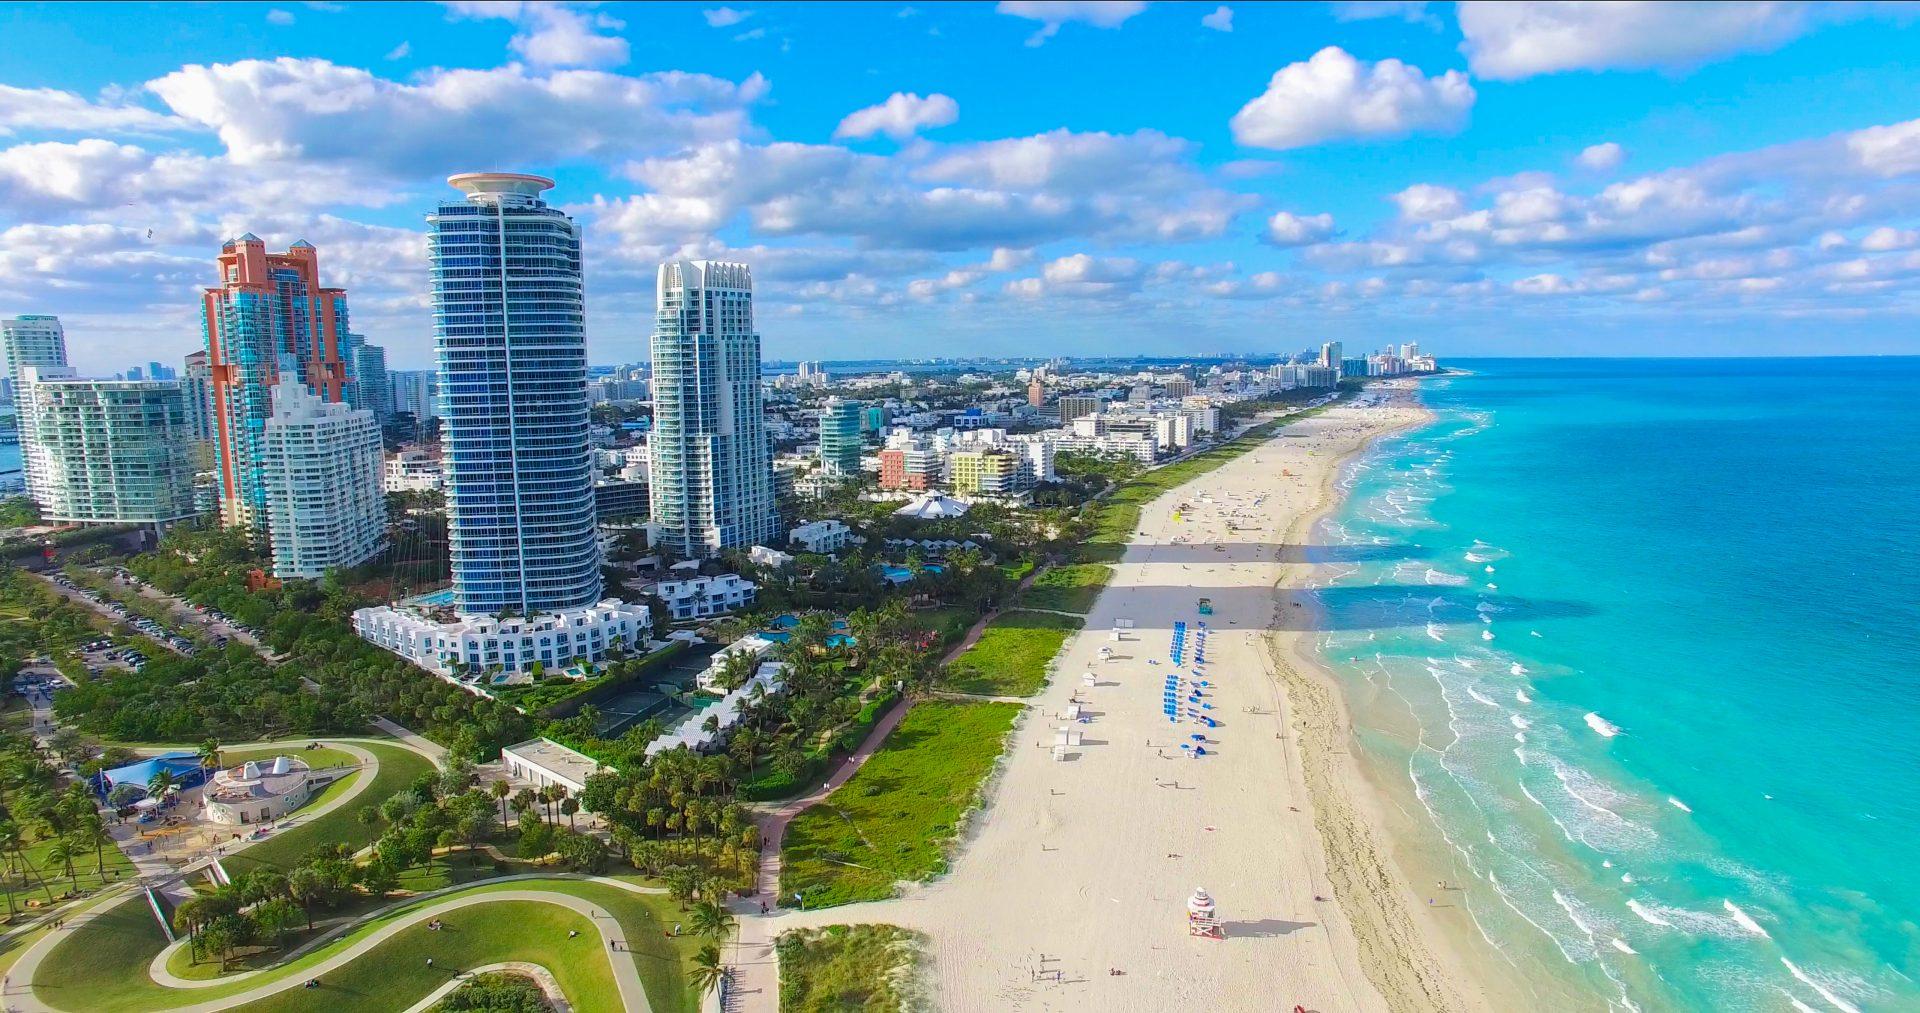 Маями бийч, Маями, Флорида